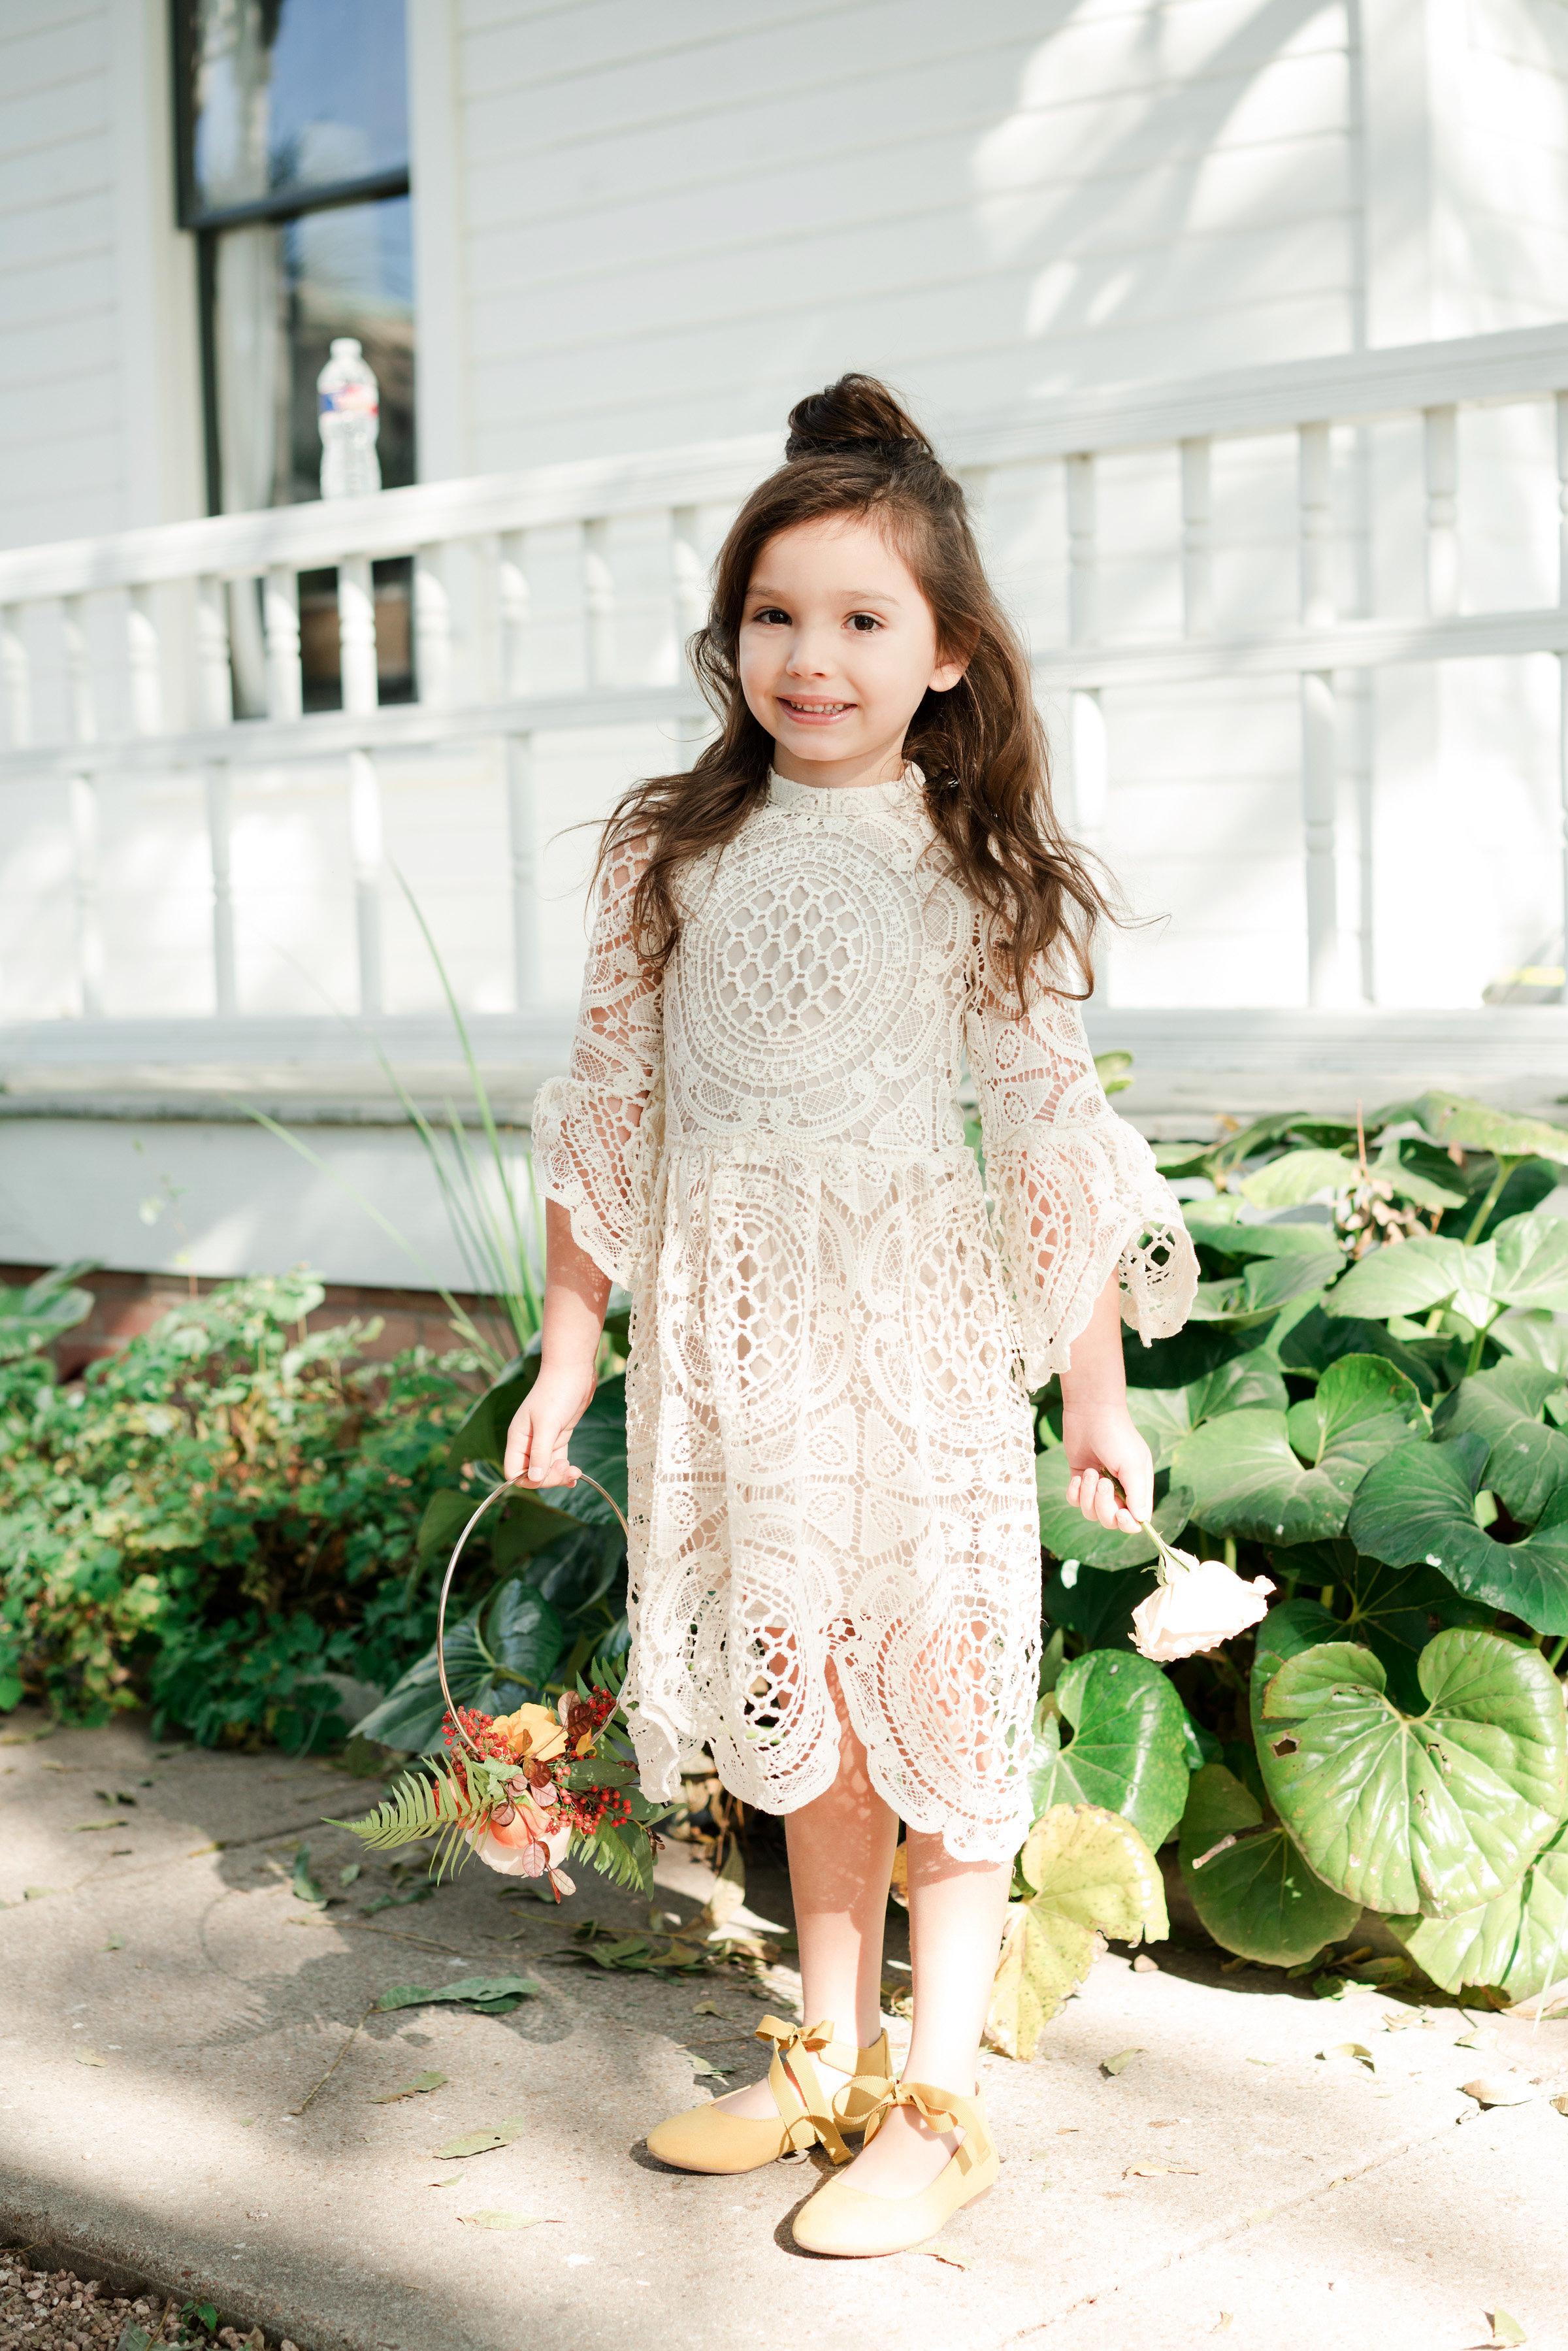 hayleigh corey wedding flower girl